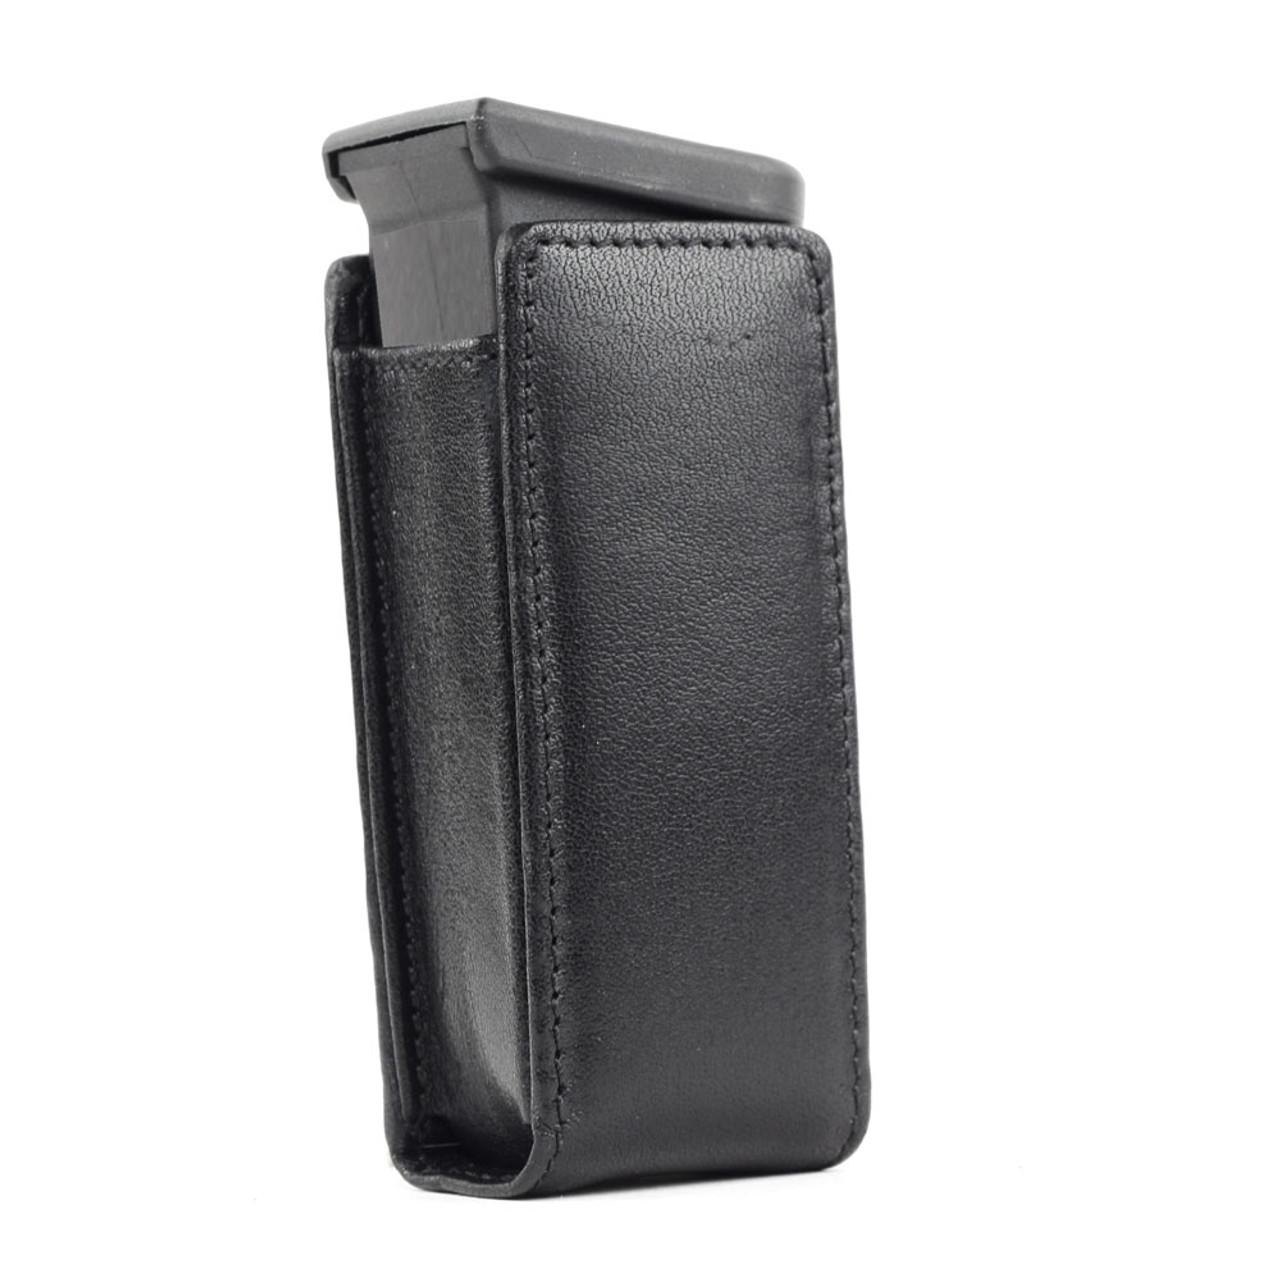 Glock 42 Magazine Pocket Protector